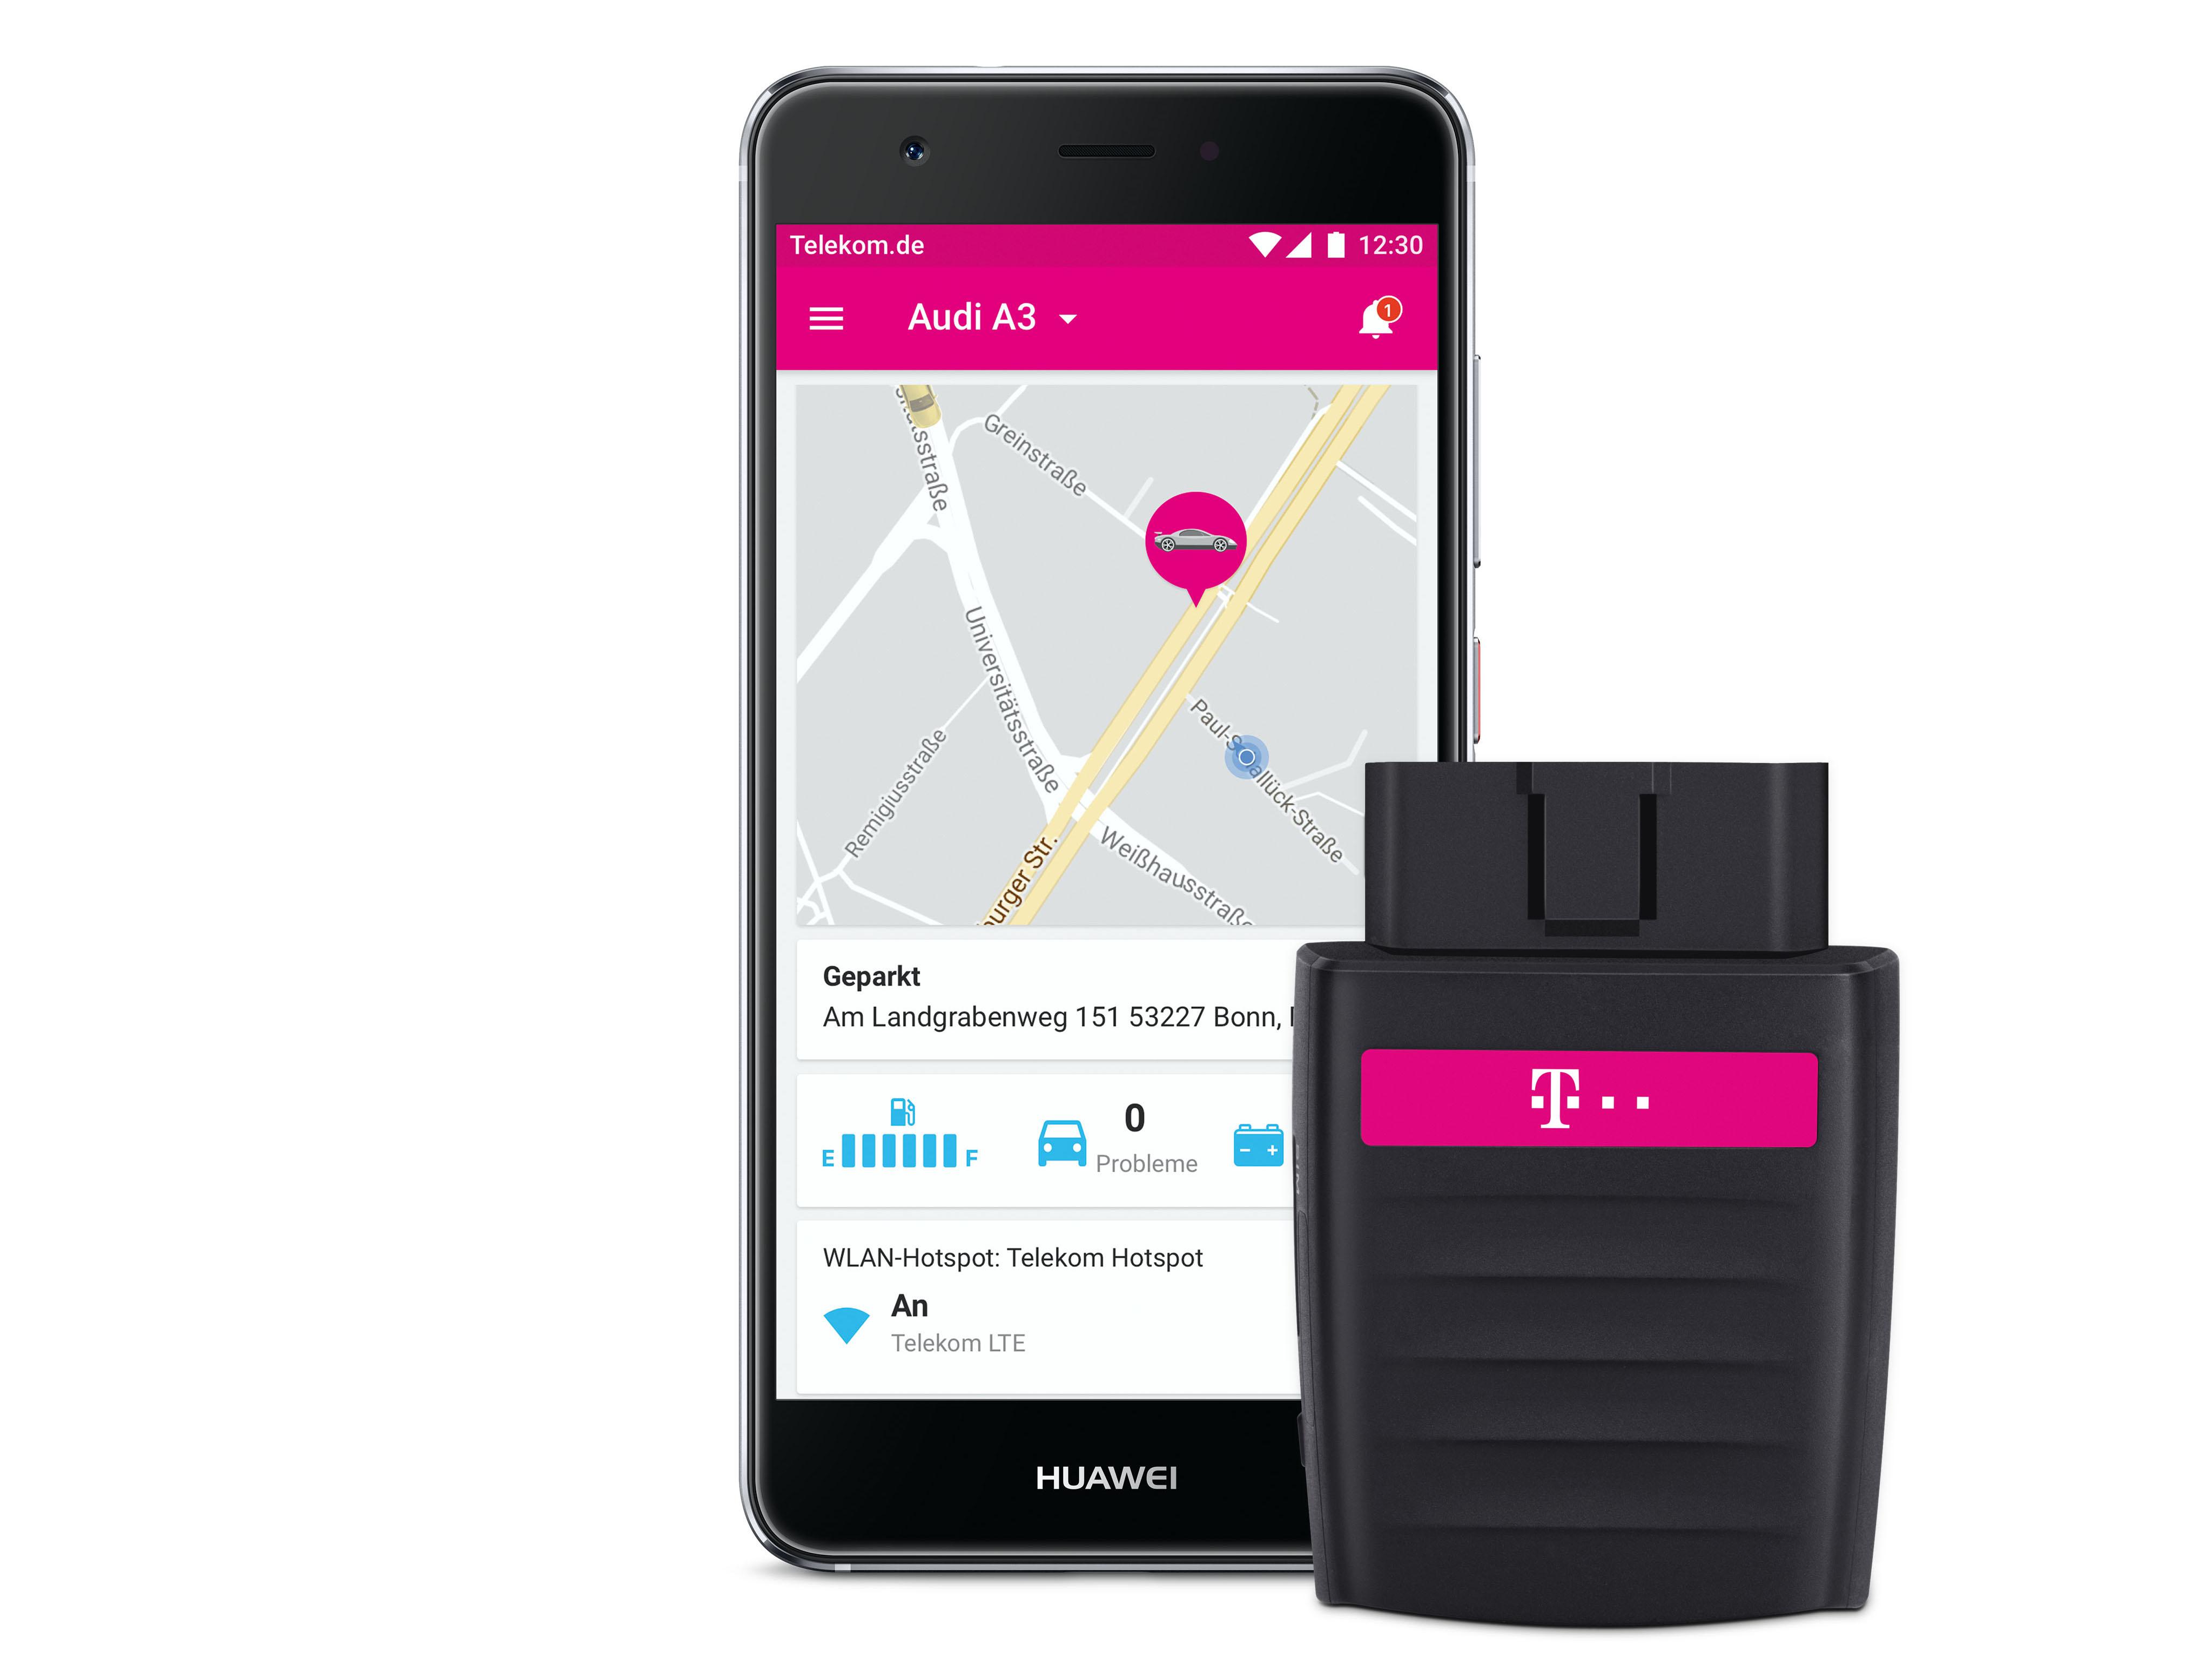 CarConnect für Magenta Mobil Kunden (ab S) kostenlos (Lokal - div. Orte)